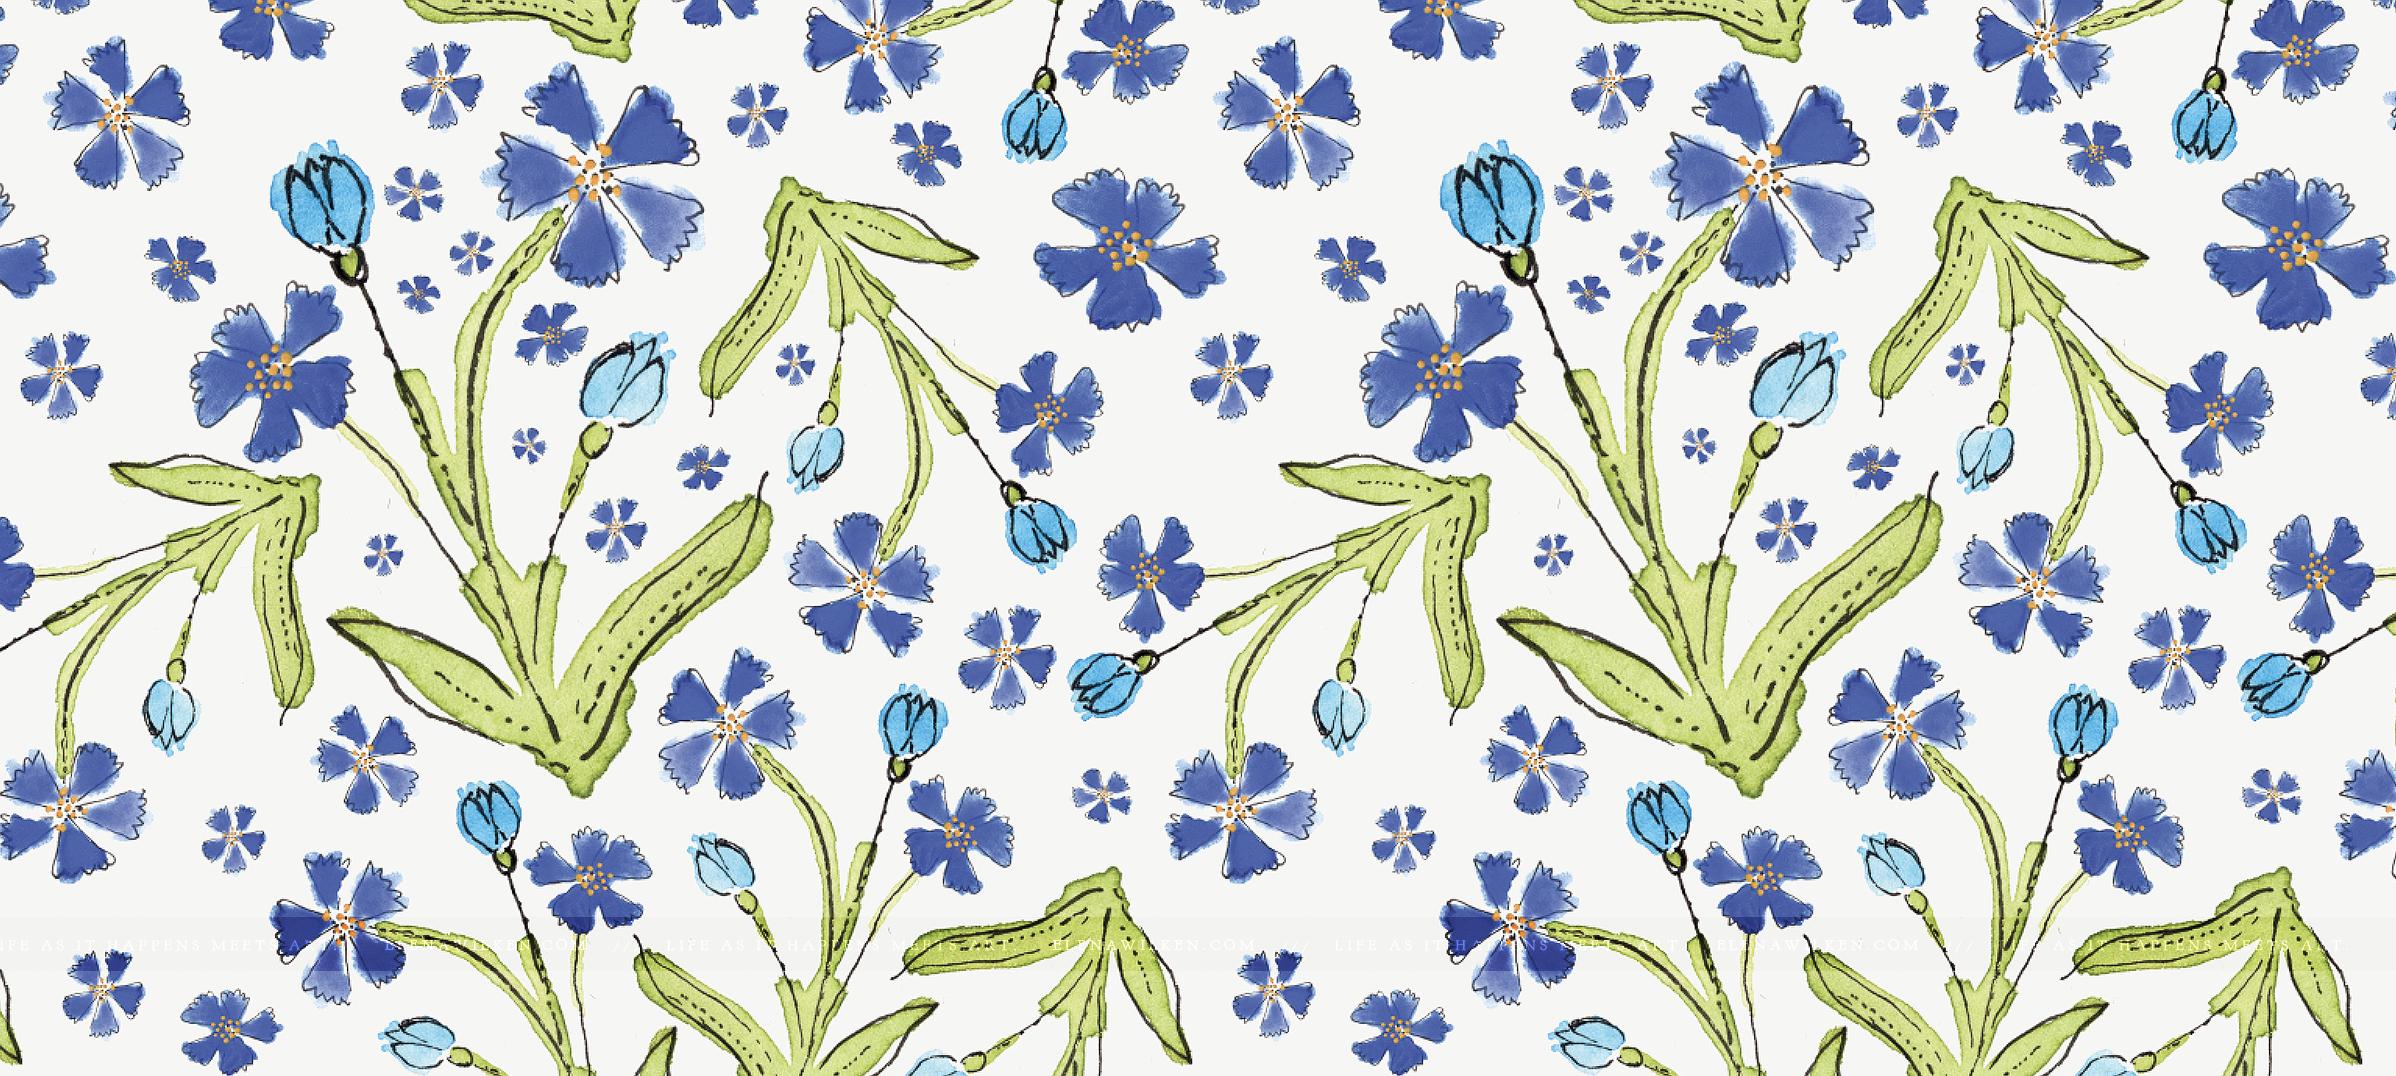 elena-wilken-whimsical-watercolor-fields-surface-pattern-design10.png